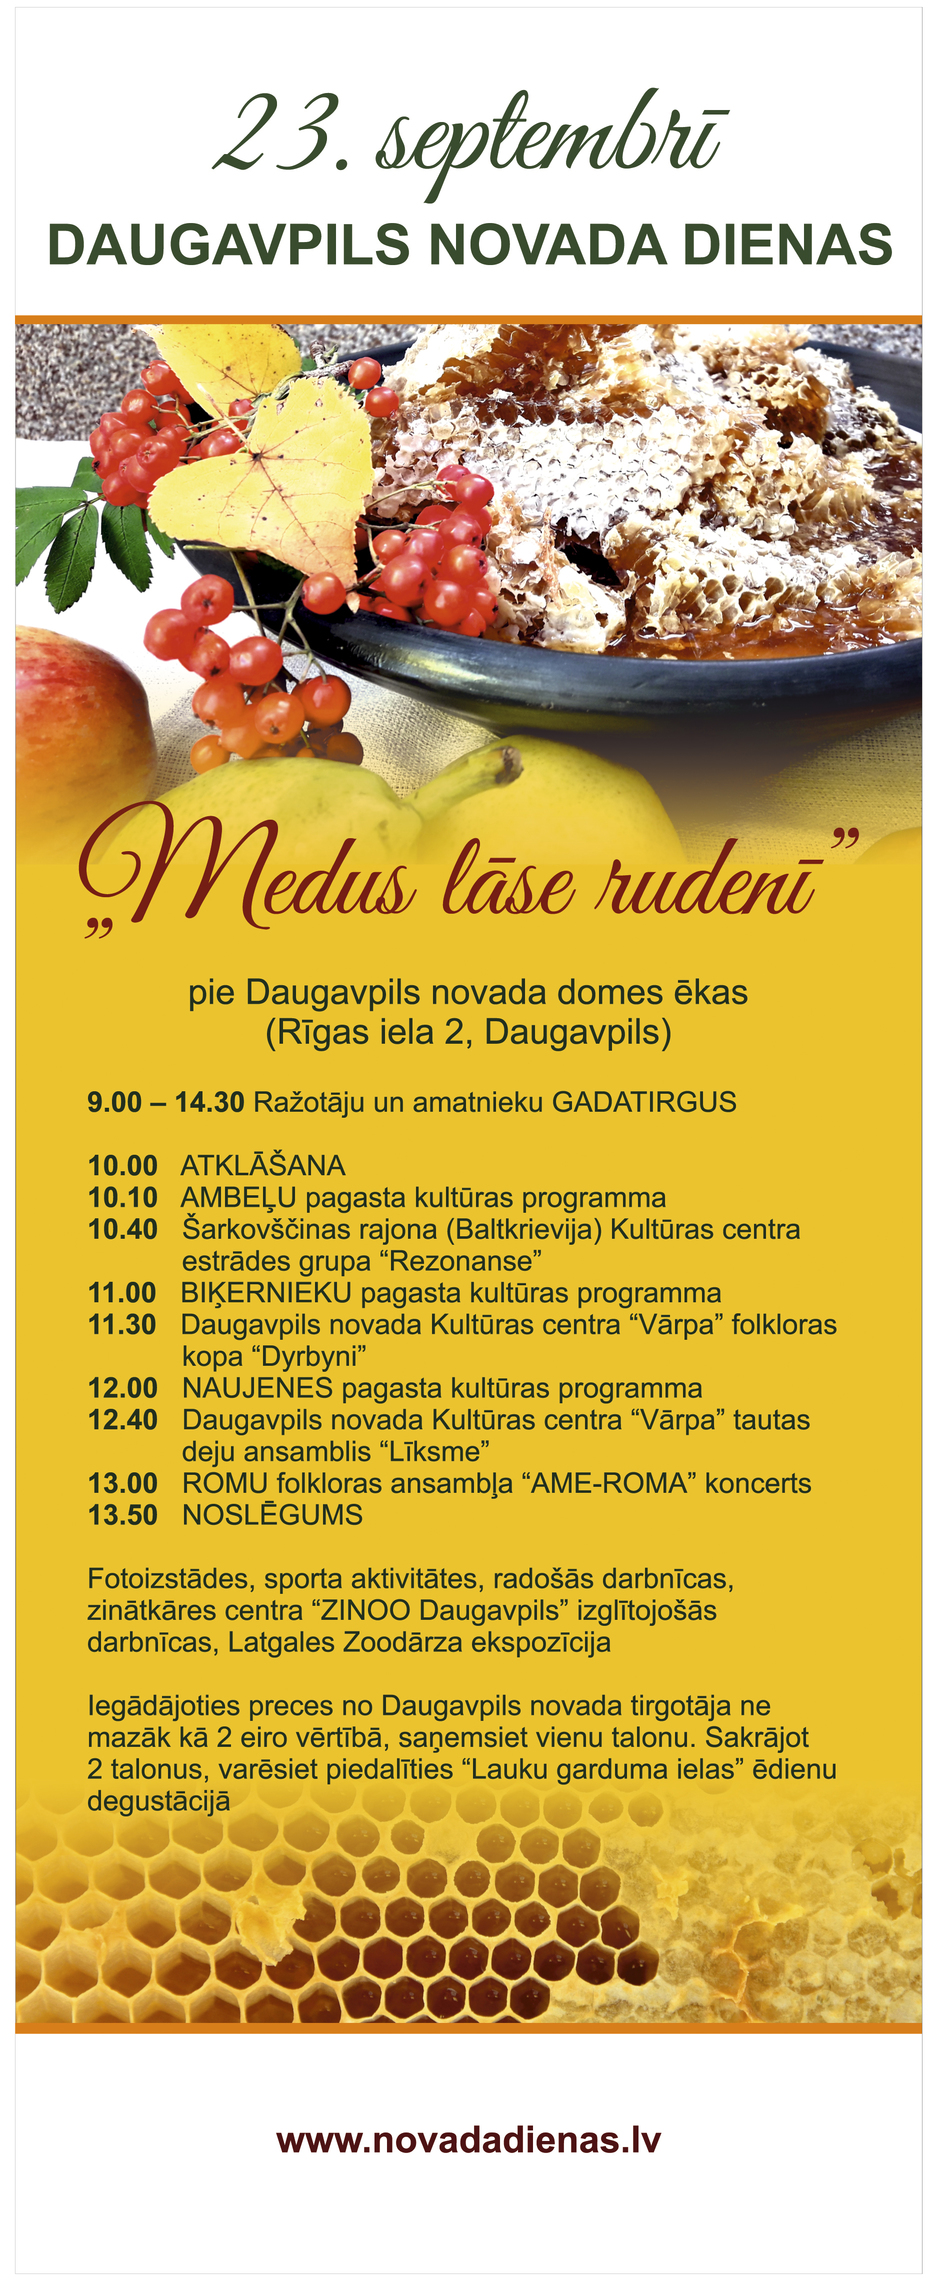 Daugovpiļs nūvoda dīnys @ Pi Daugovpiļs nūvoda dūmis kuorma | Daugavpils | Latvia